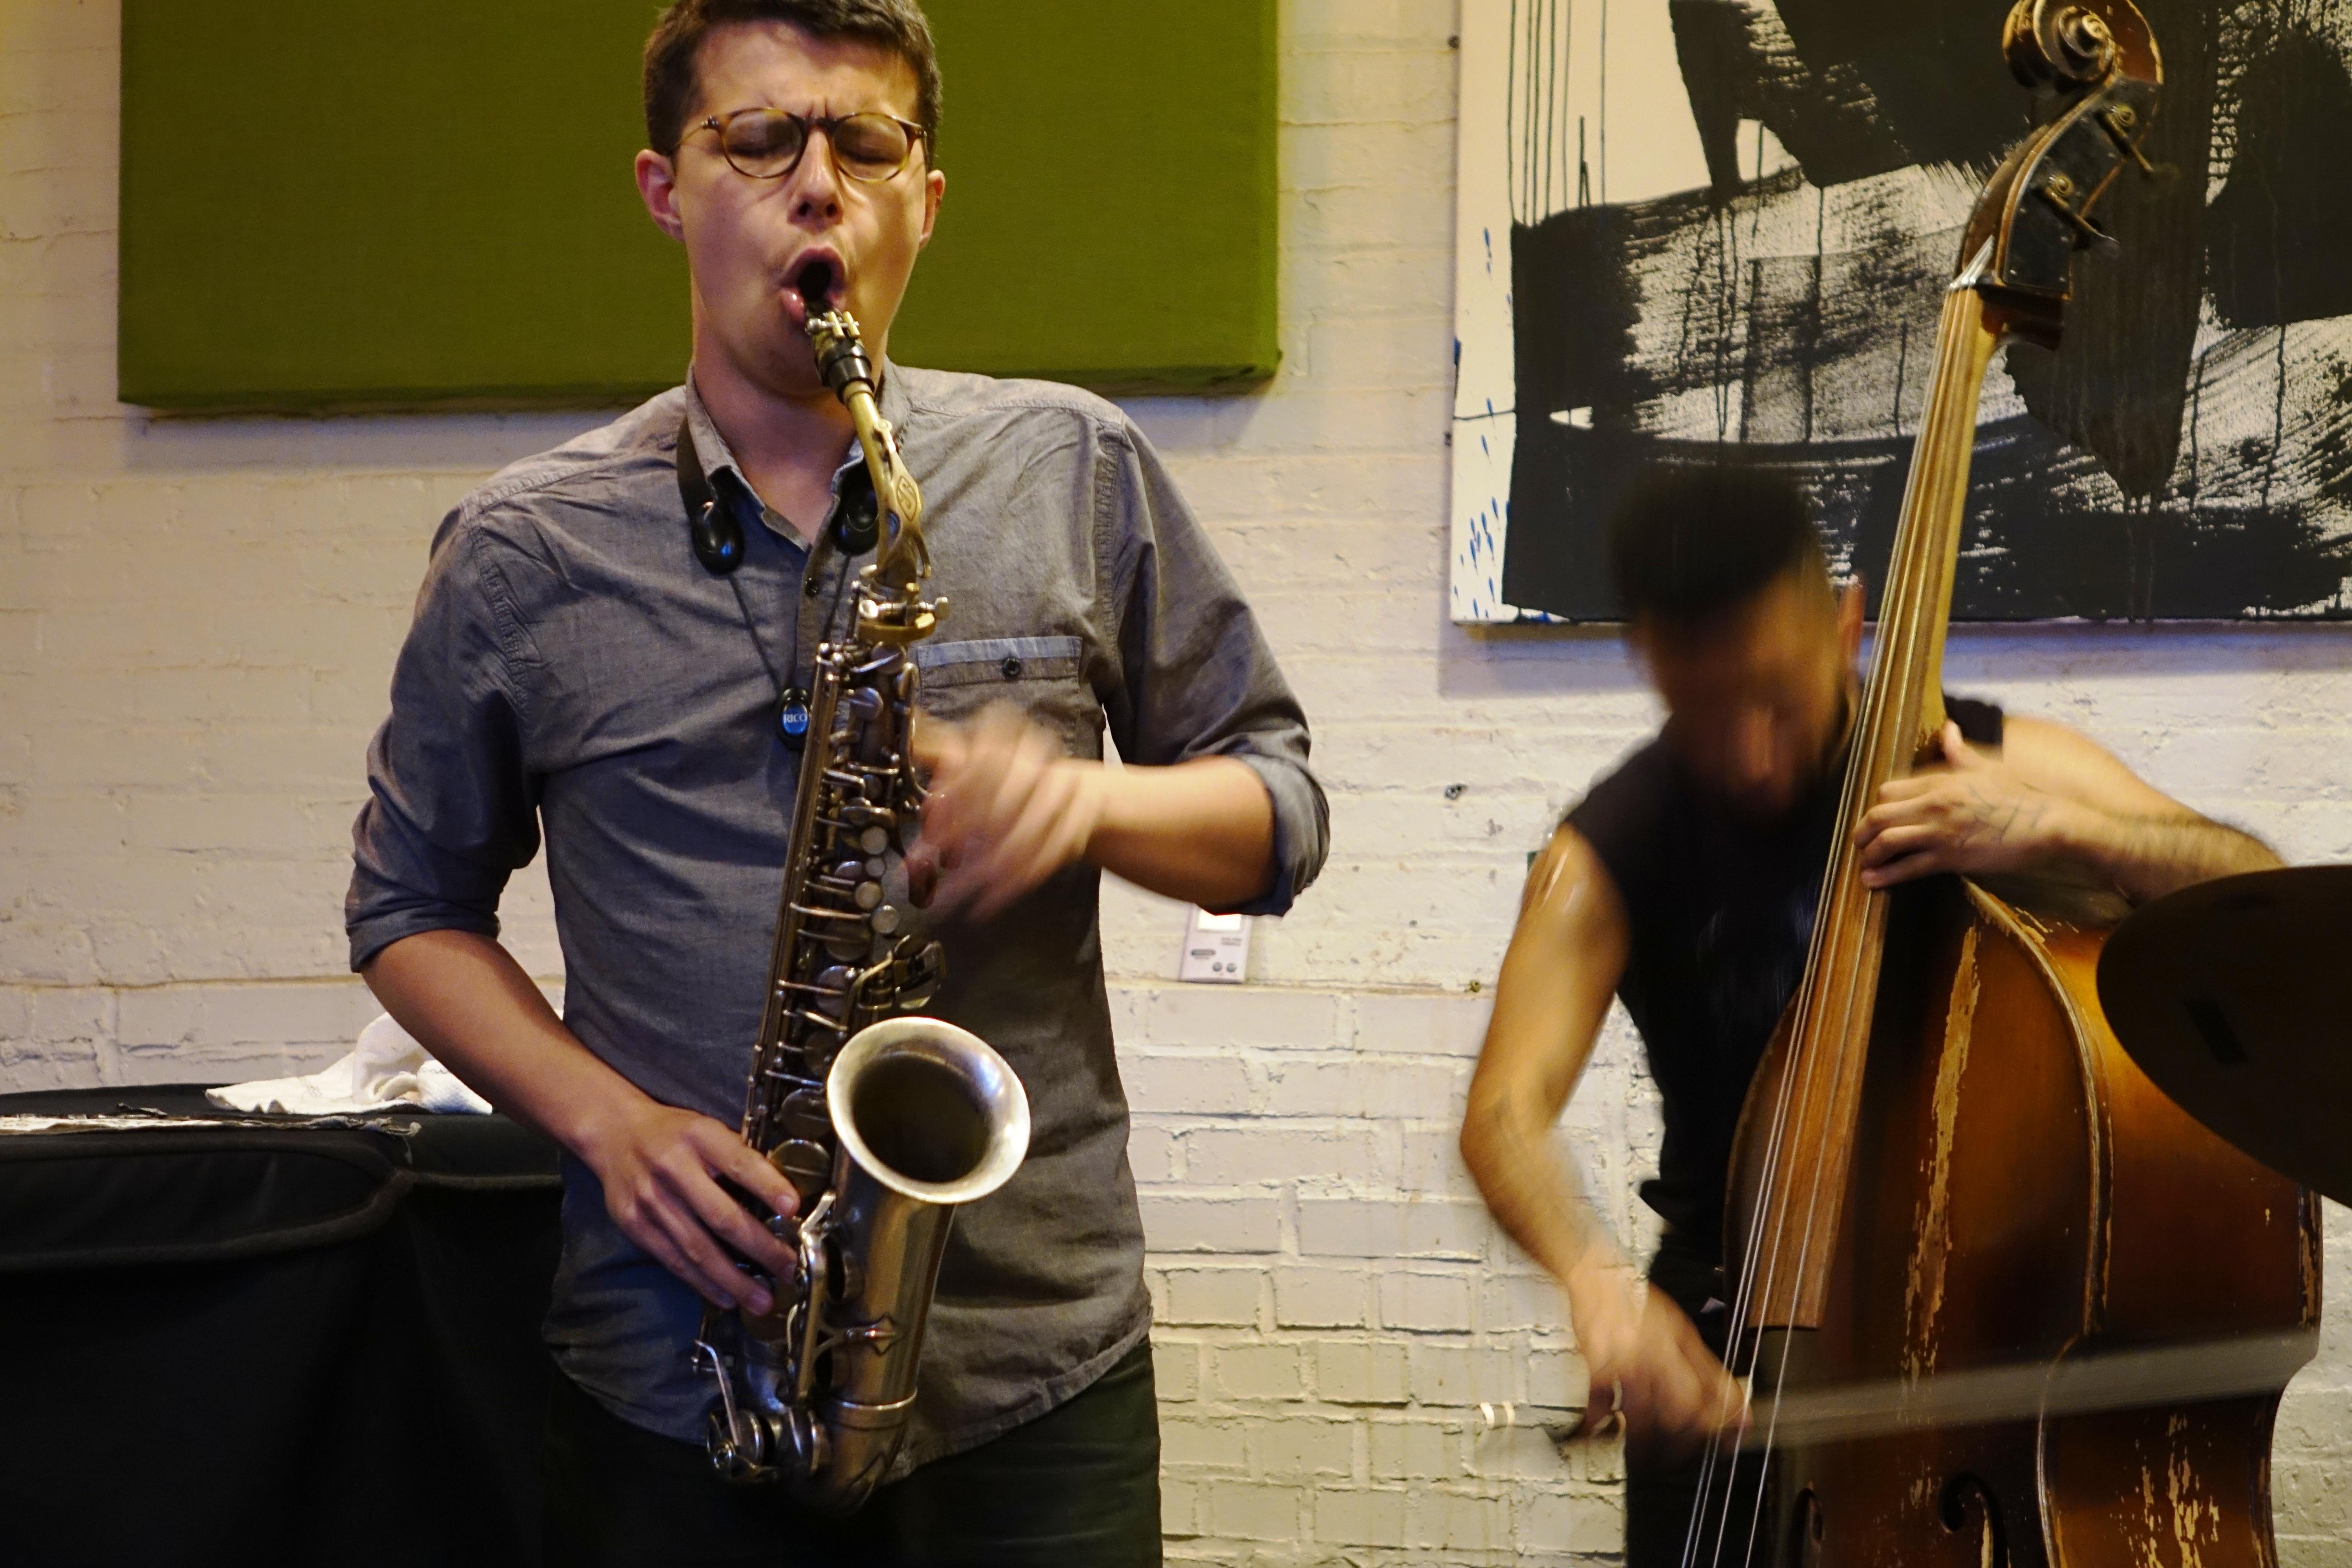 David Leon and Nick Dunston at IBeam, Brooklyn in June 2019